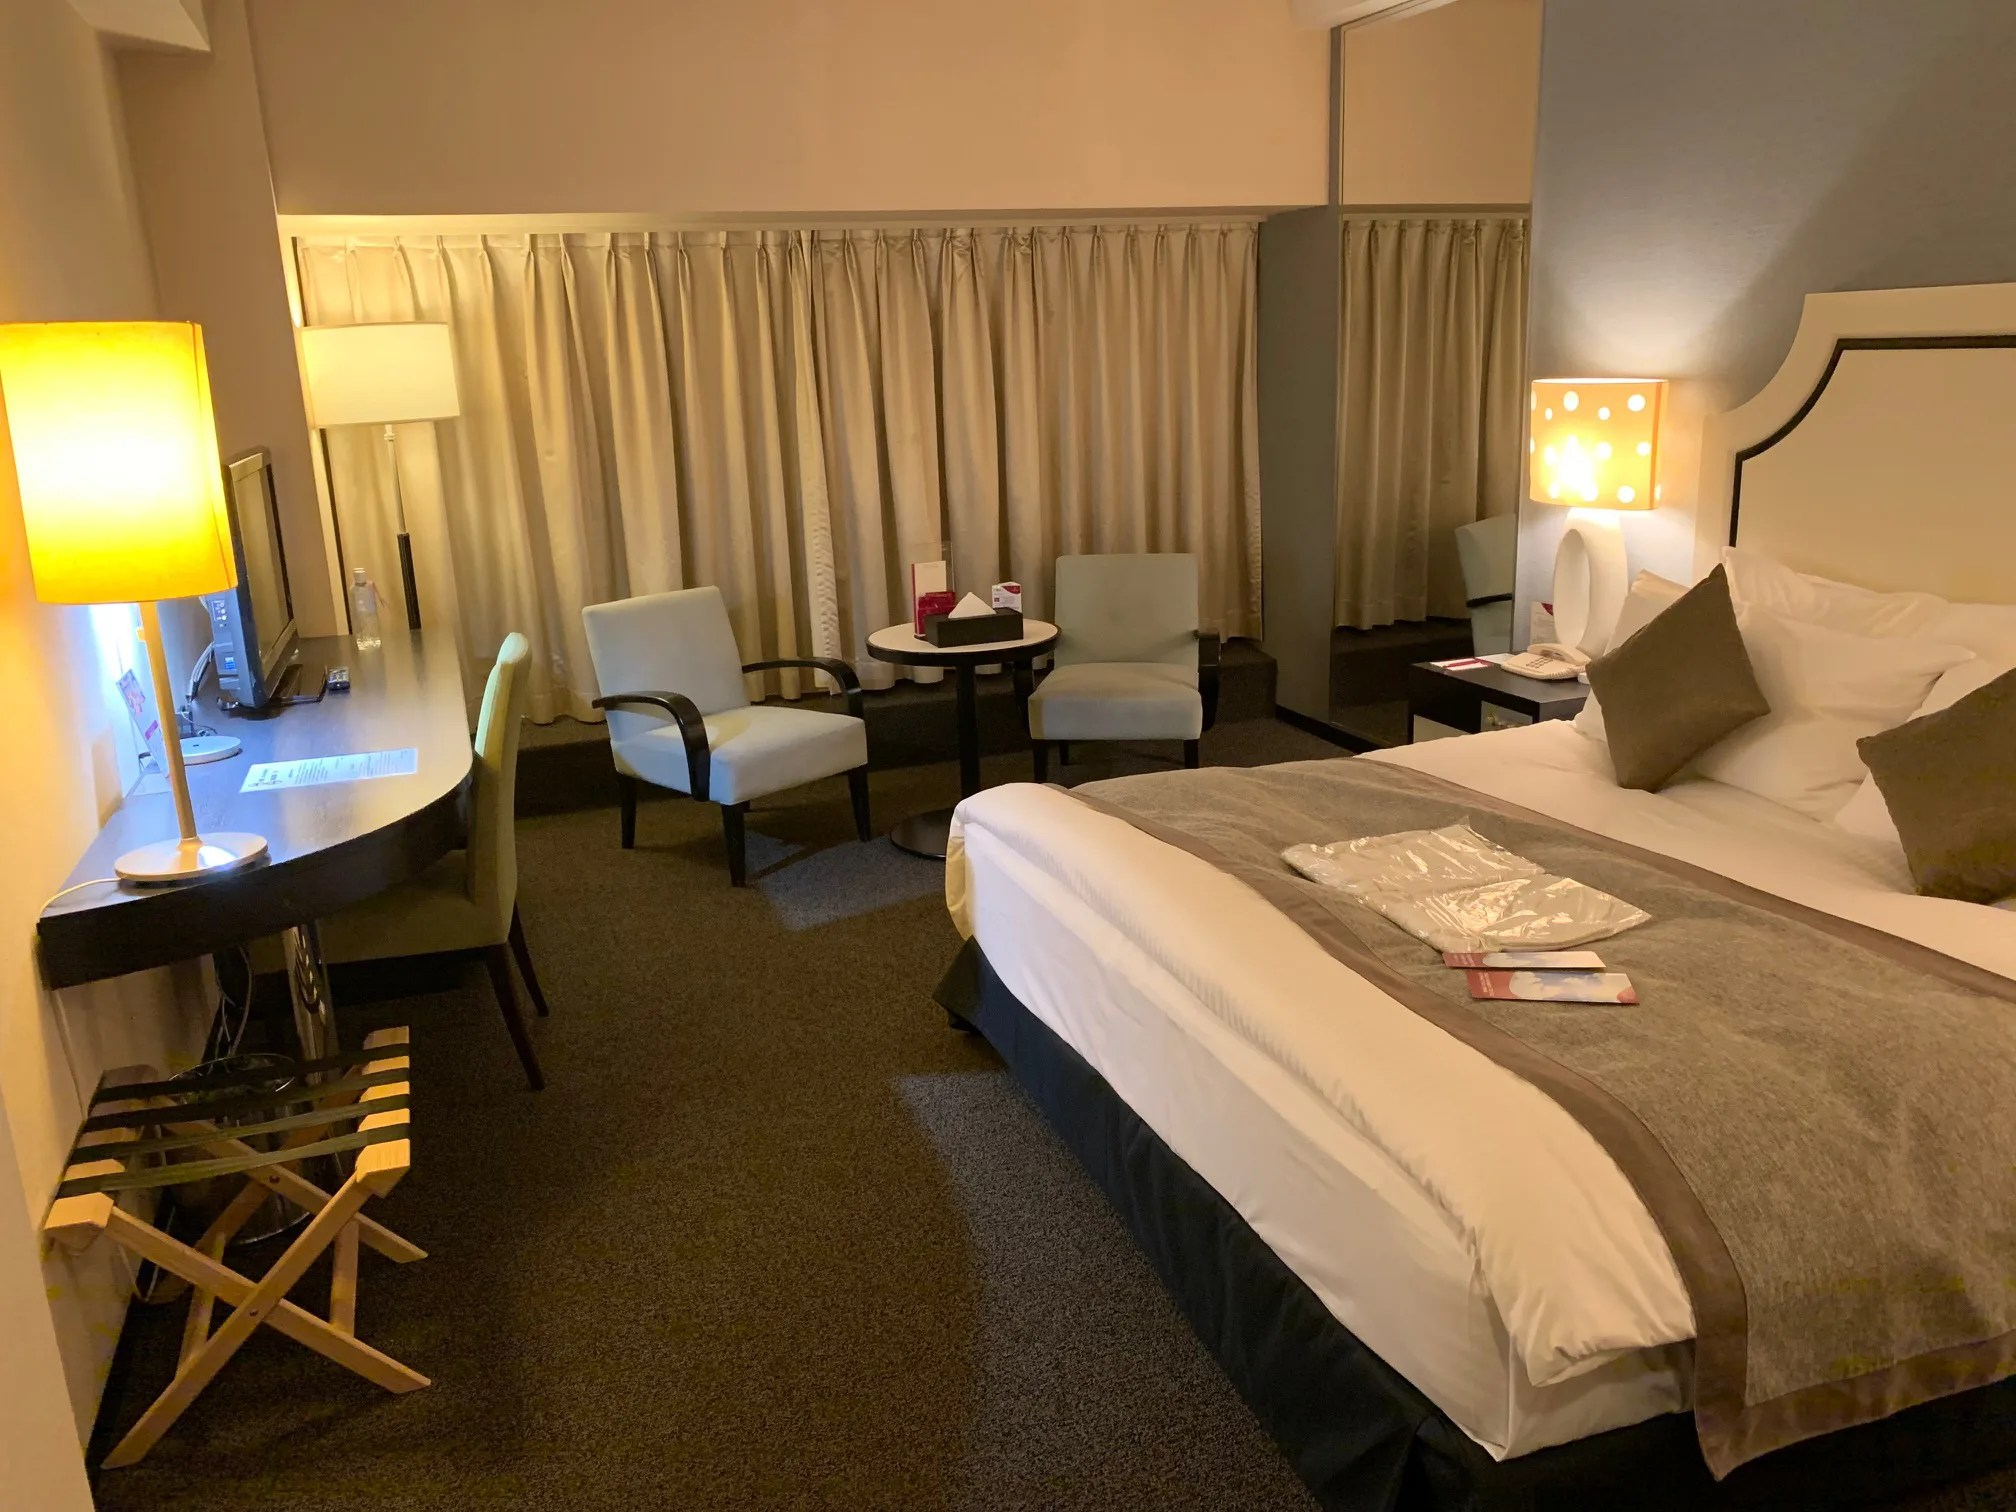 ANAクラウンプラザホテル熊本 スーペリアダブル宿泊記